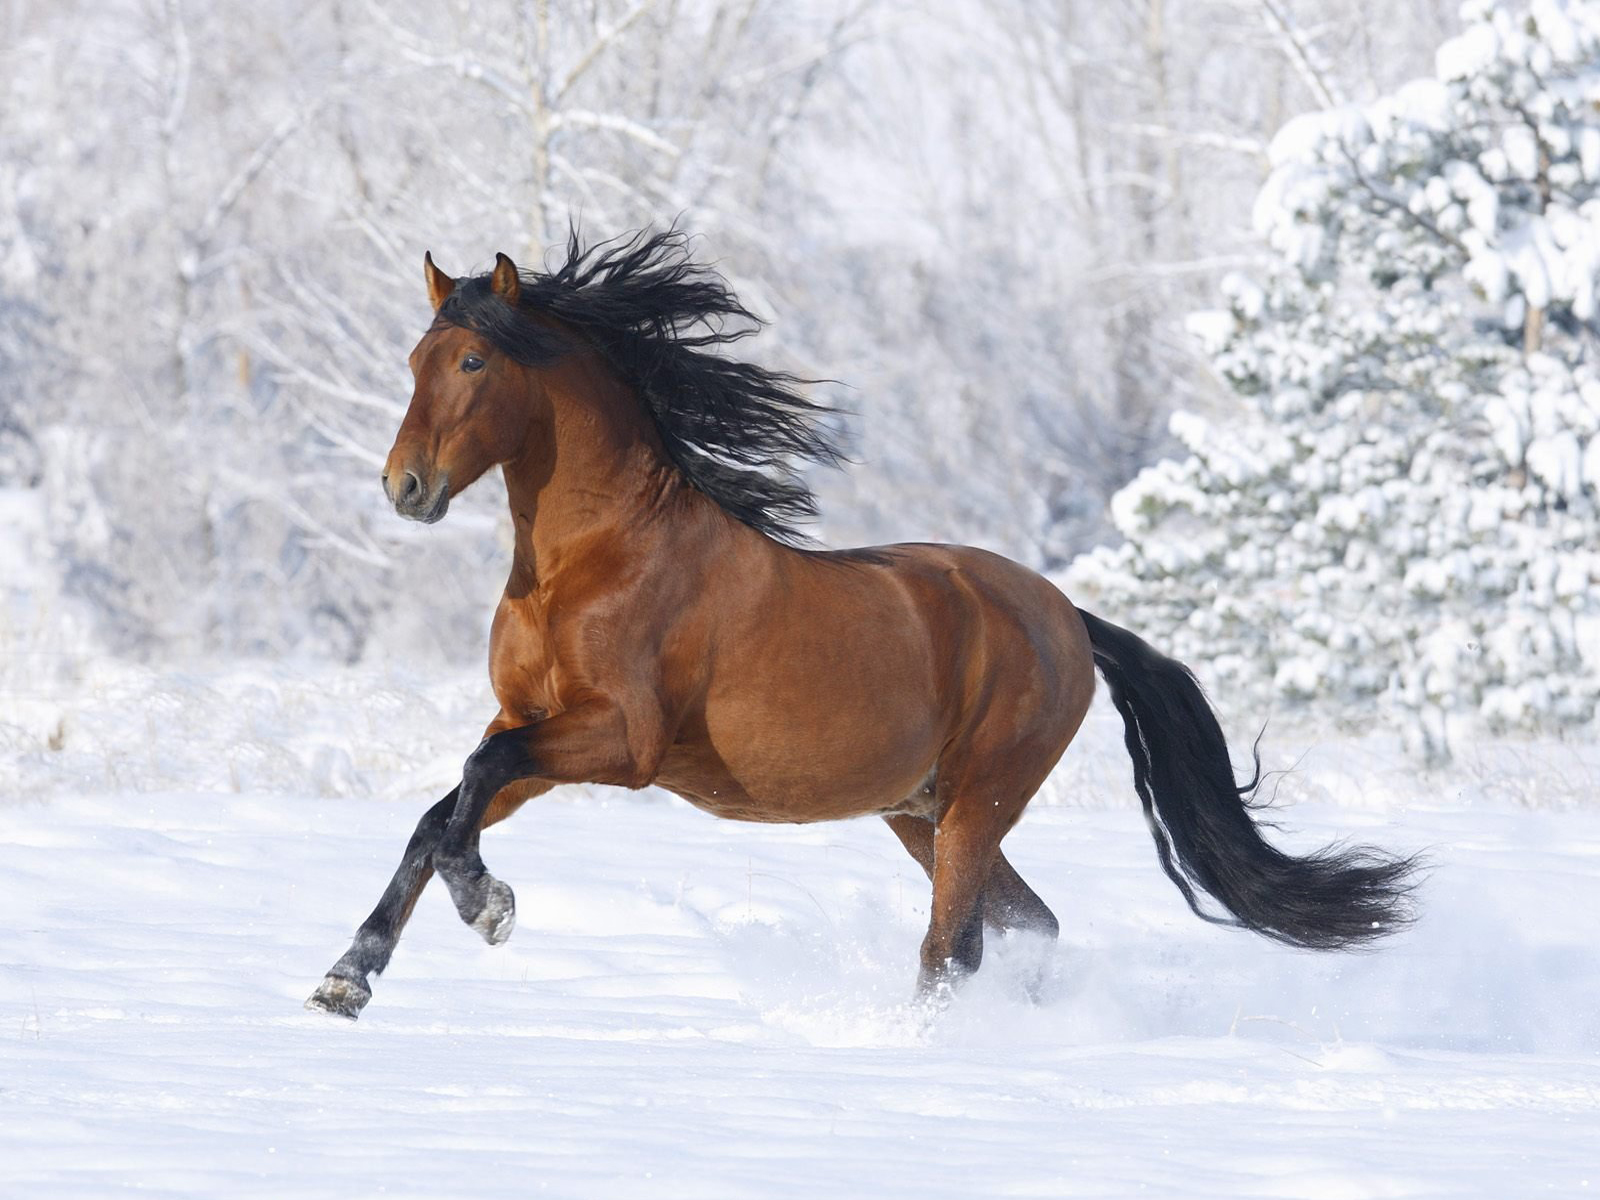 Horse on the snow / 1600 x 1200 / Animals / Photography   MIRIADNA.COM